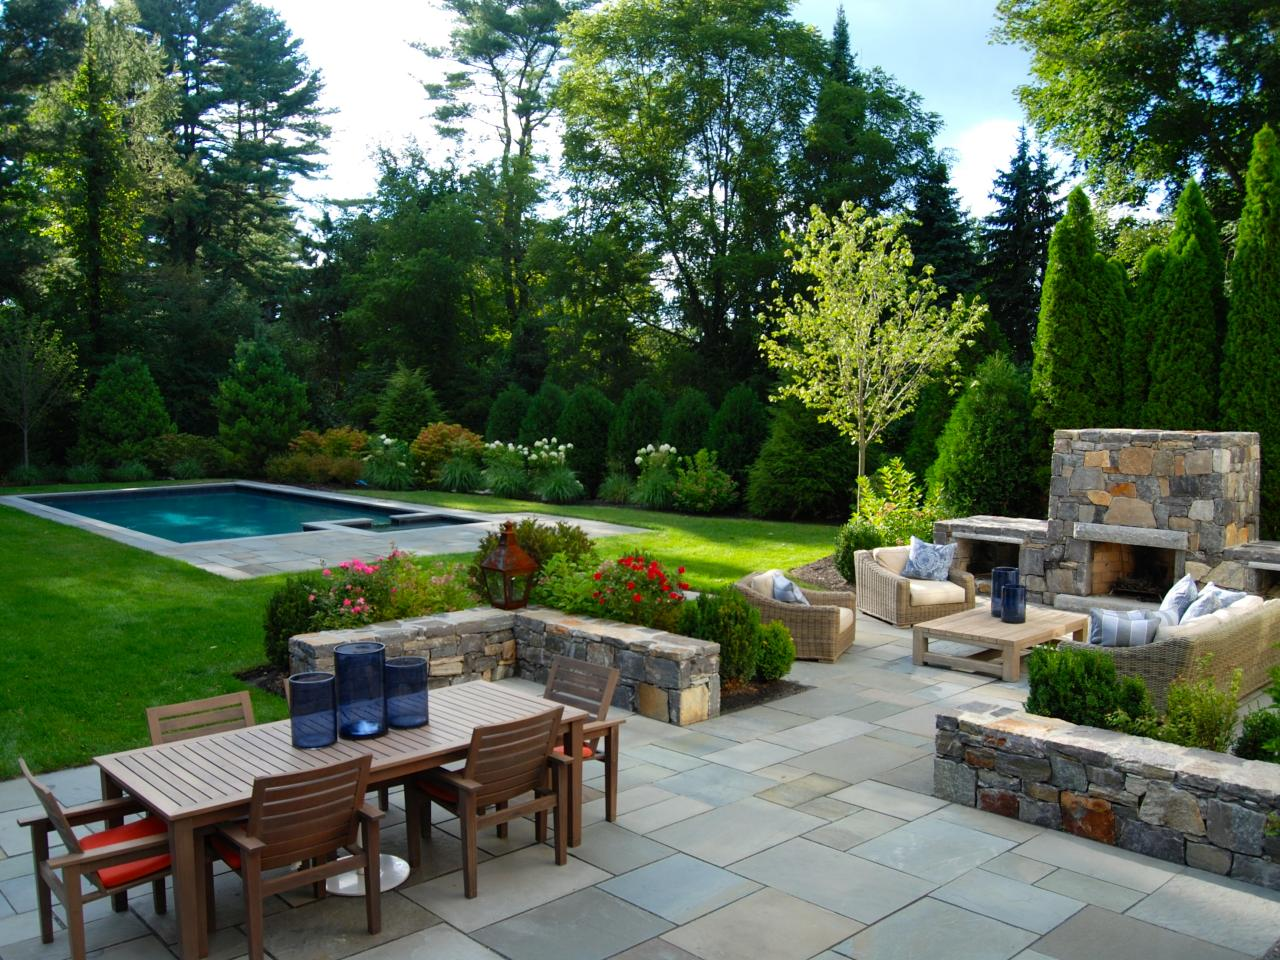 Photos | HGTV on Hgtv Backyard Designs id=83961